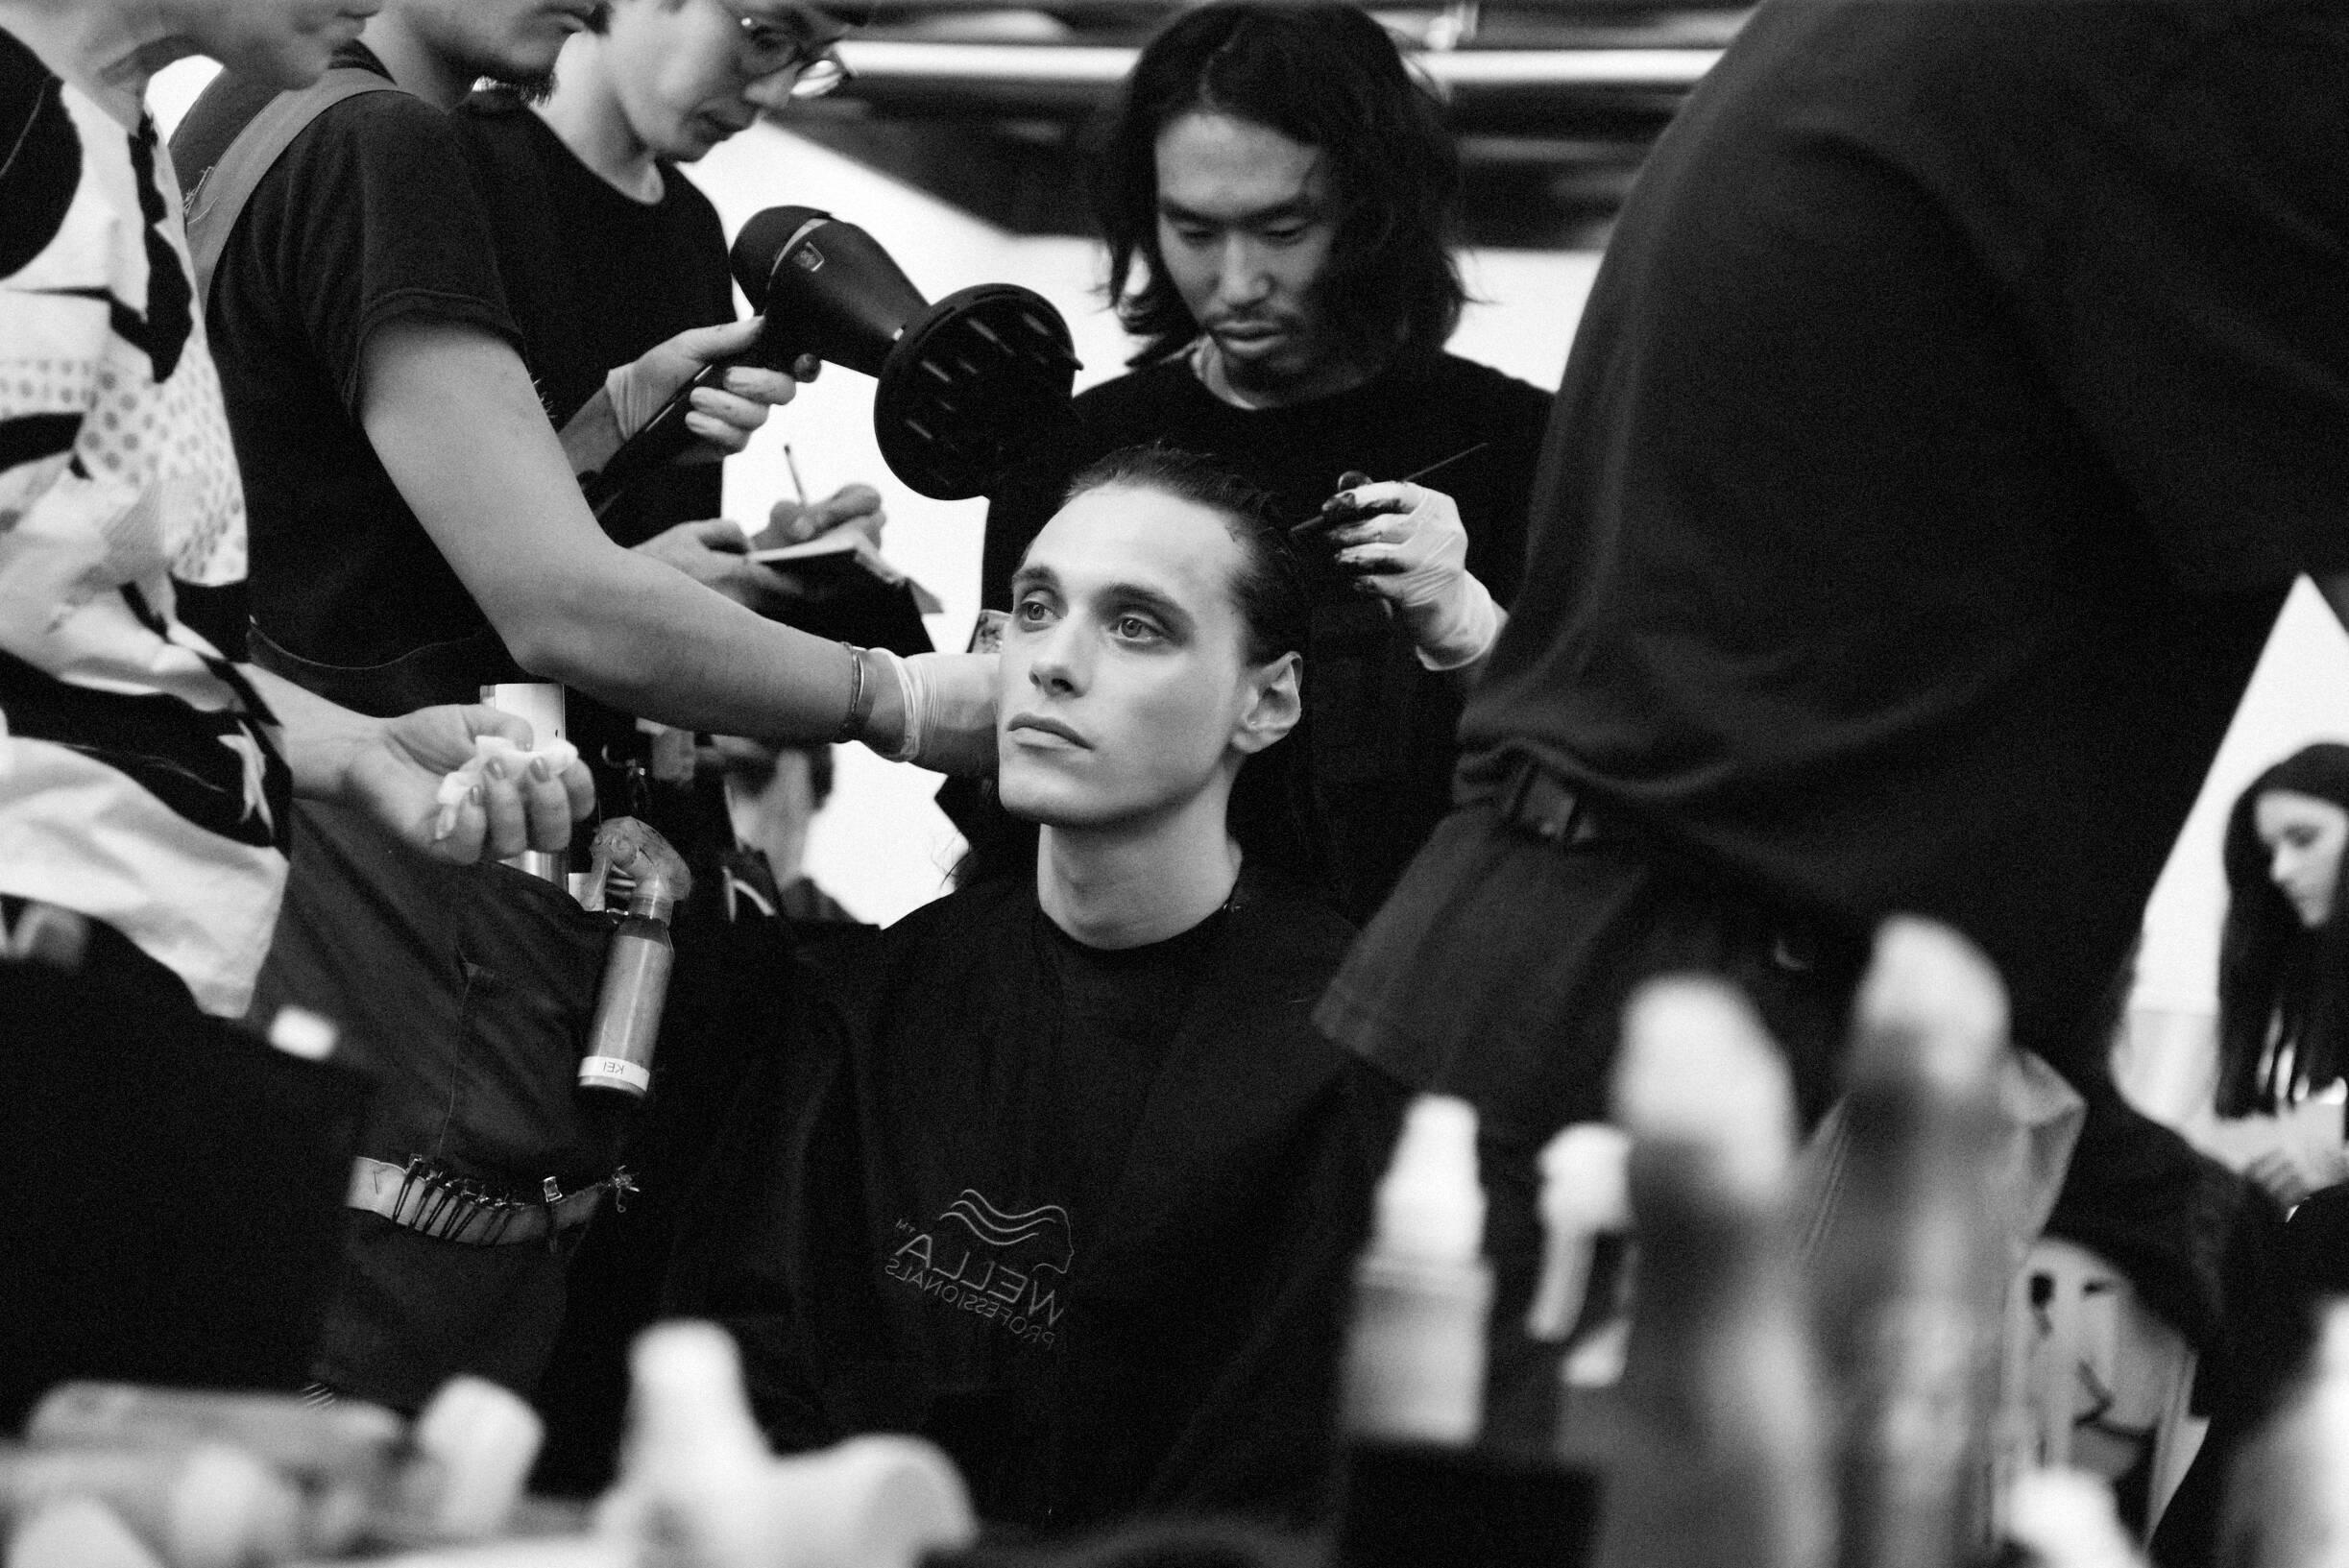 Backstage Yohji Yamamoto Hairstyle 2020